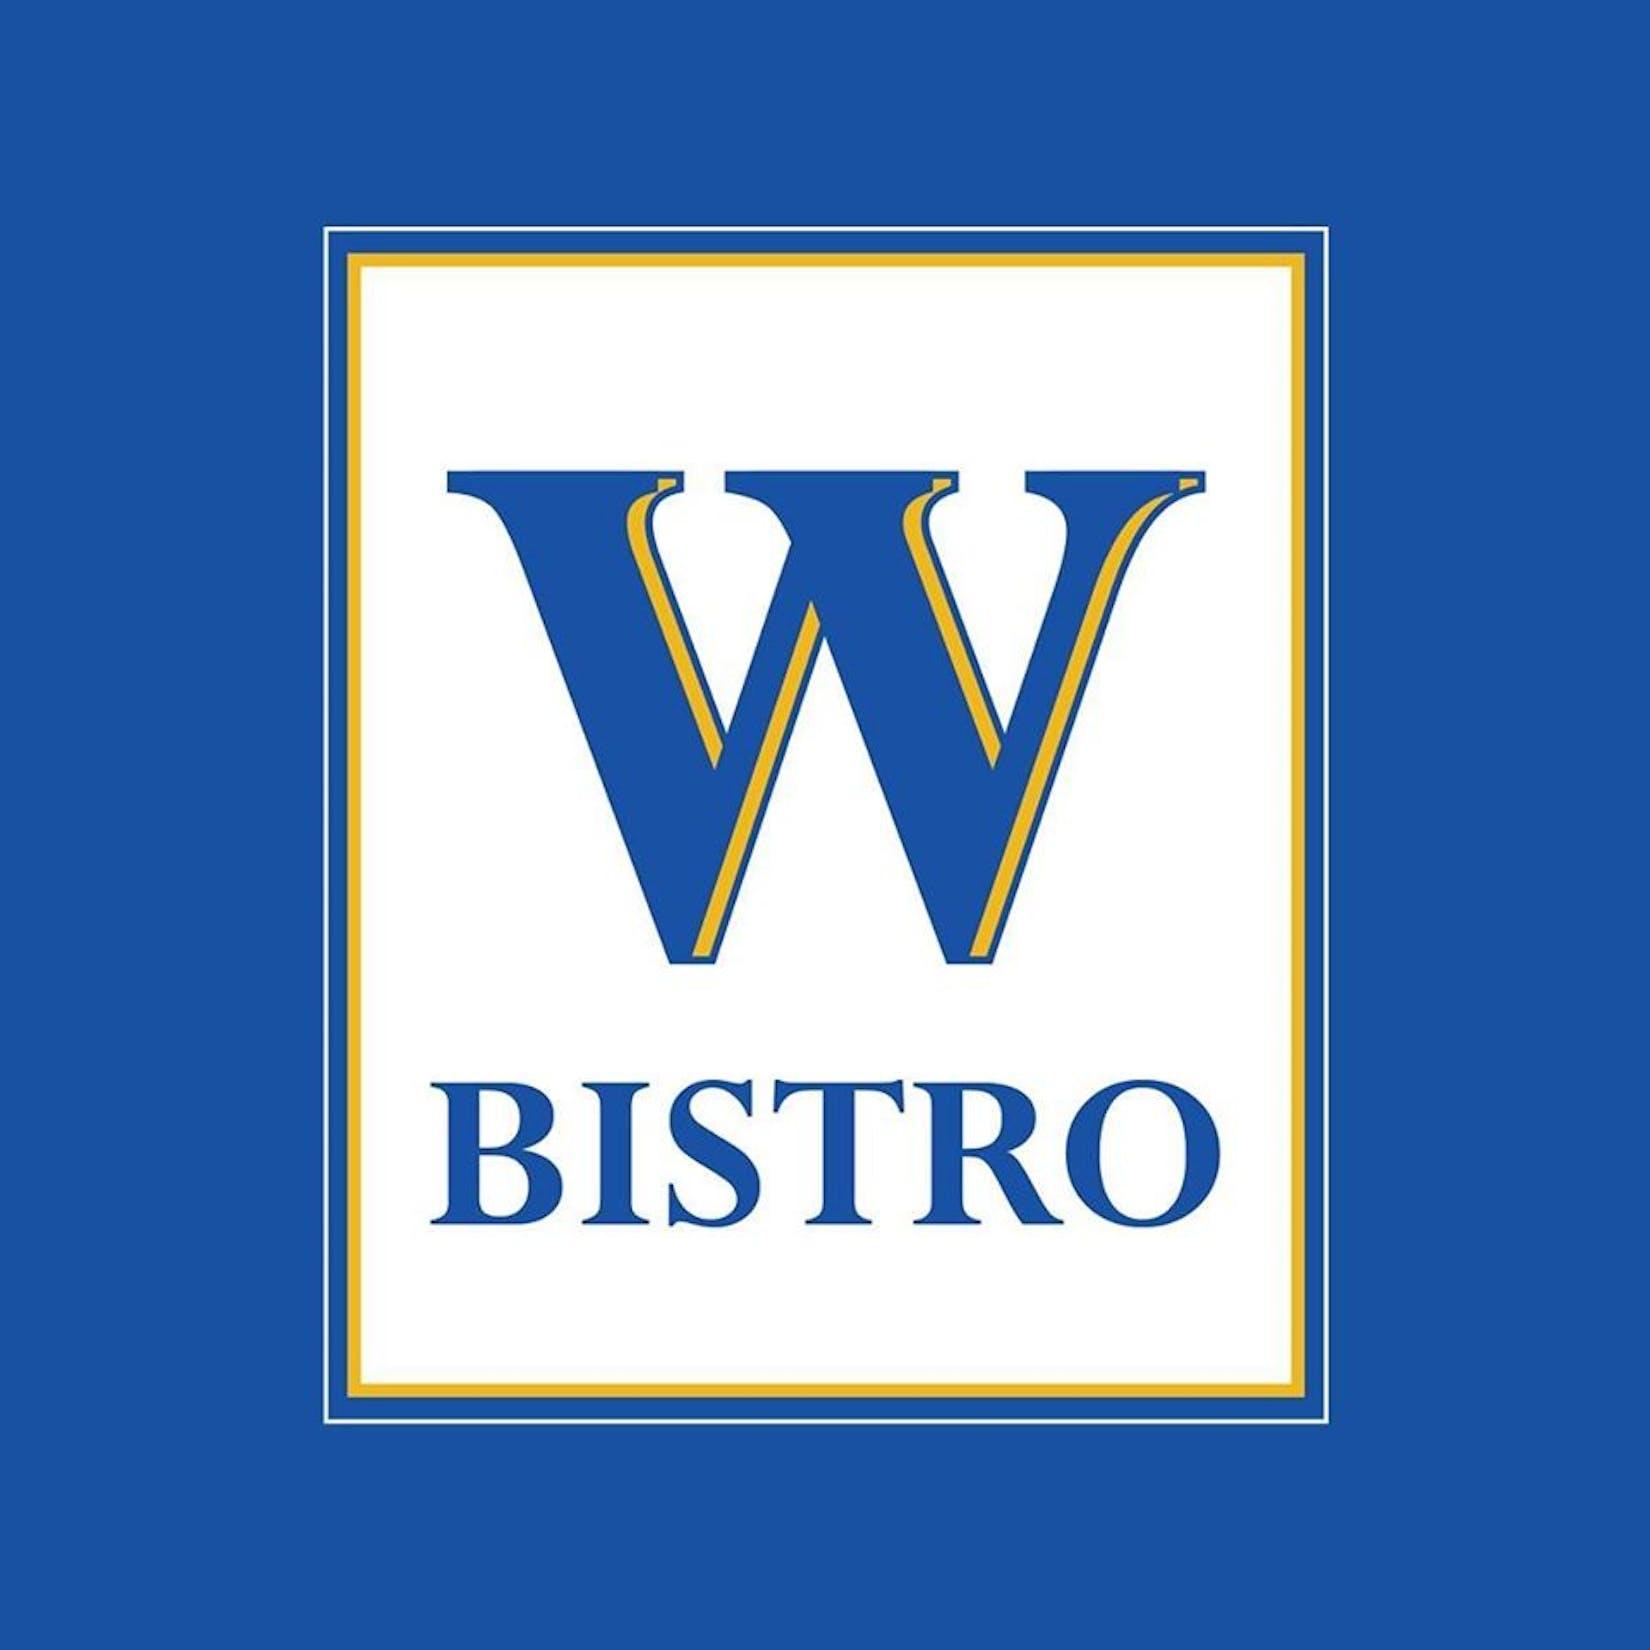 W Bistro | yathar